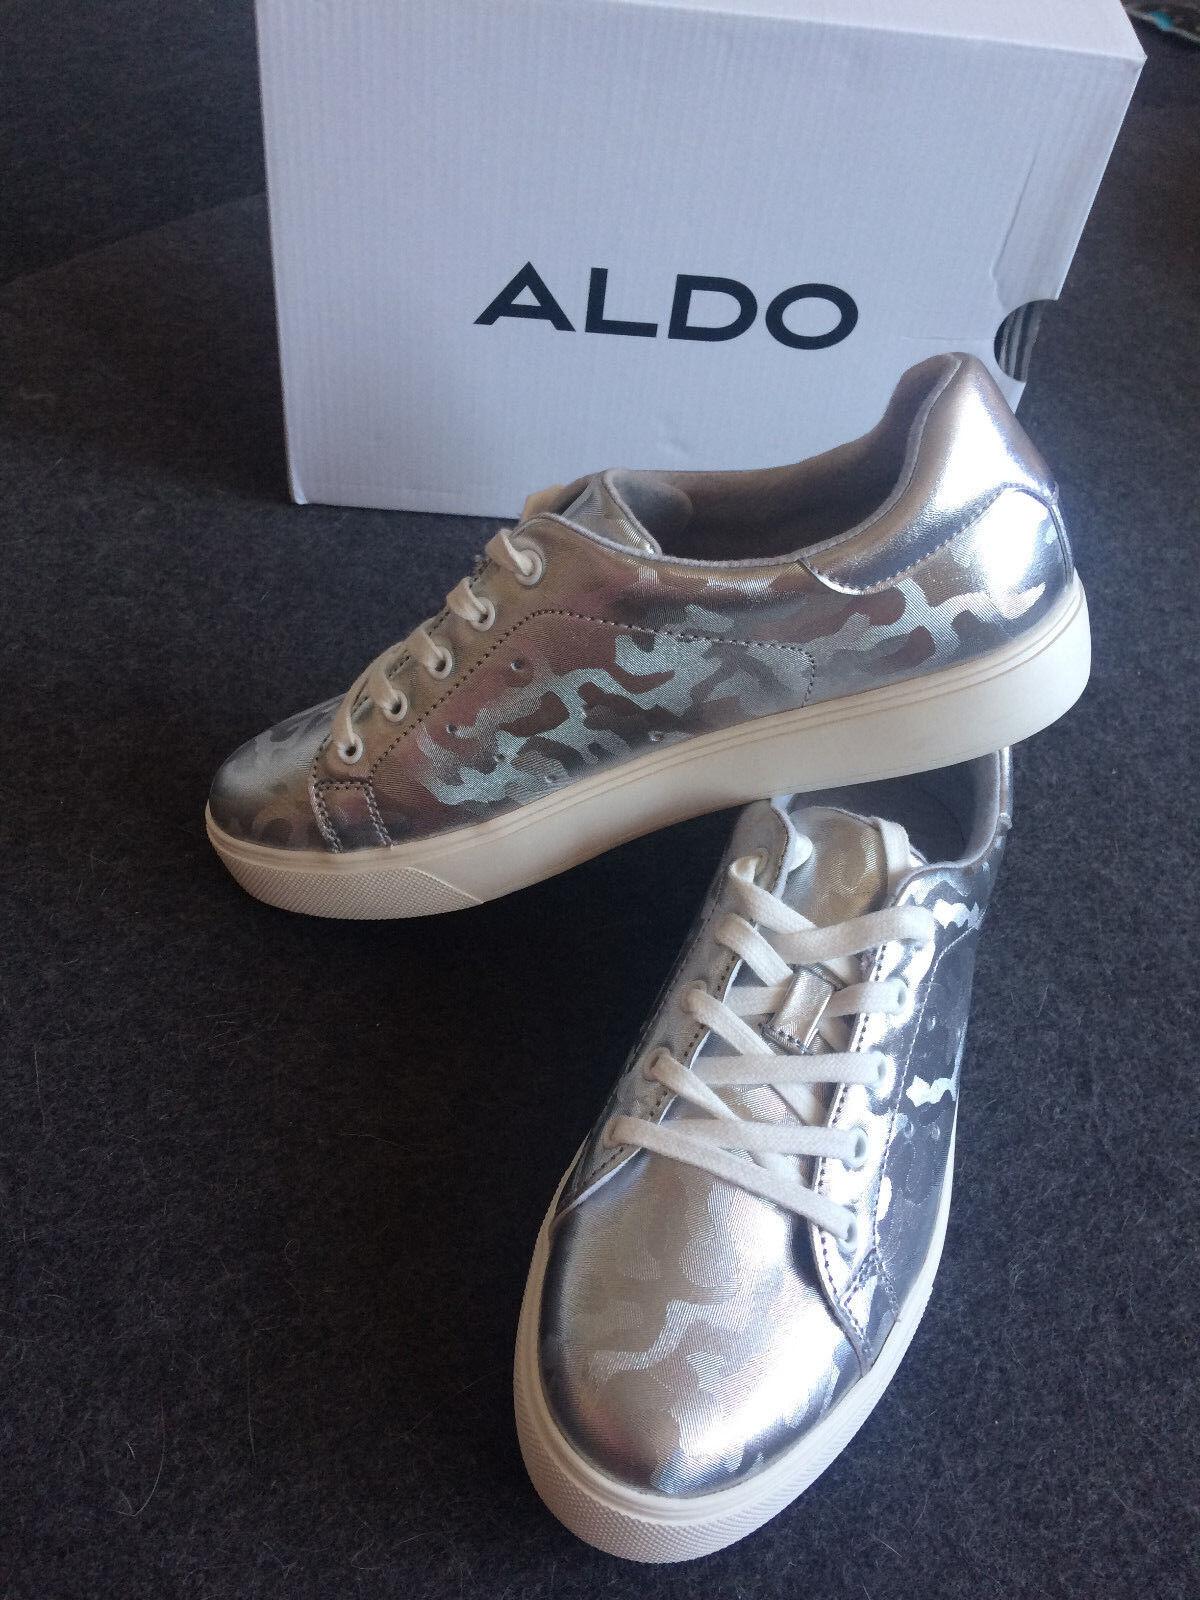 Silberne Camouflage Sneakers 40 ALDO, Gr. 38, 39, 40 Sneakers 311ad6